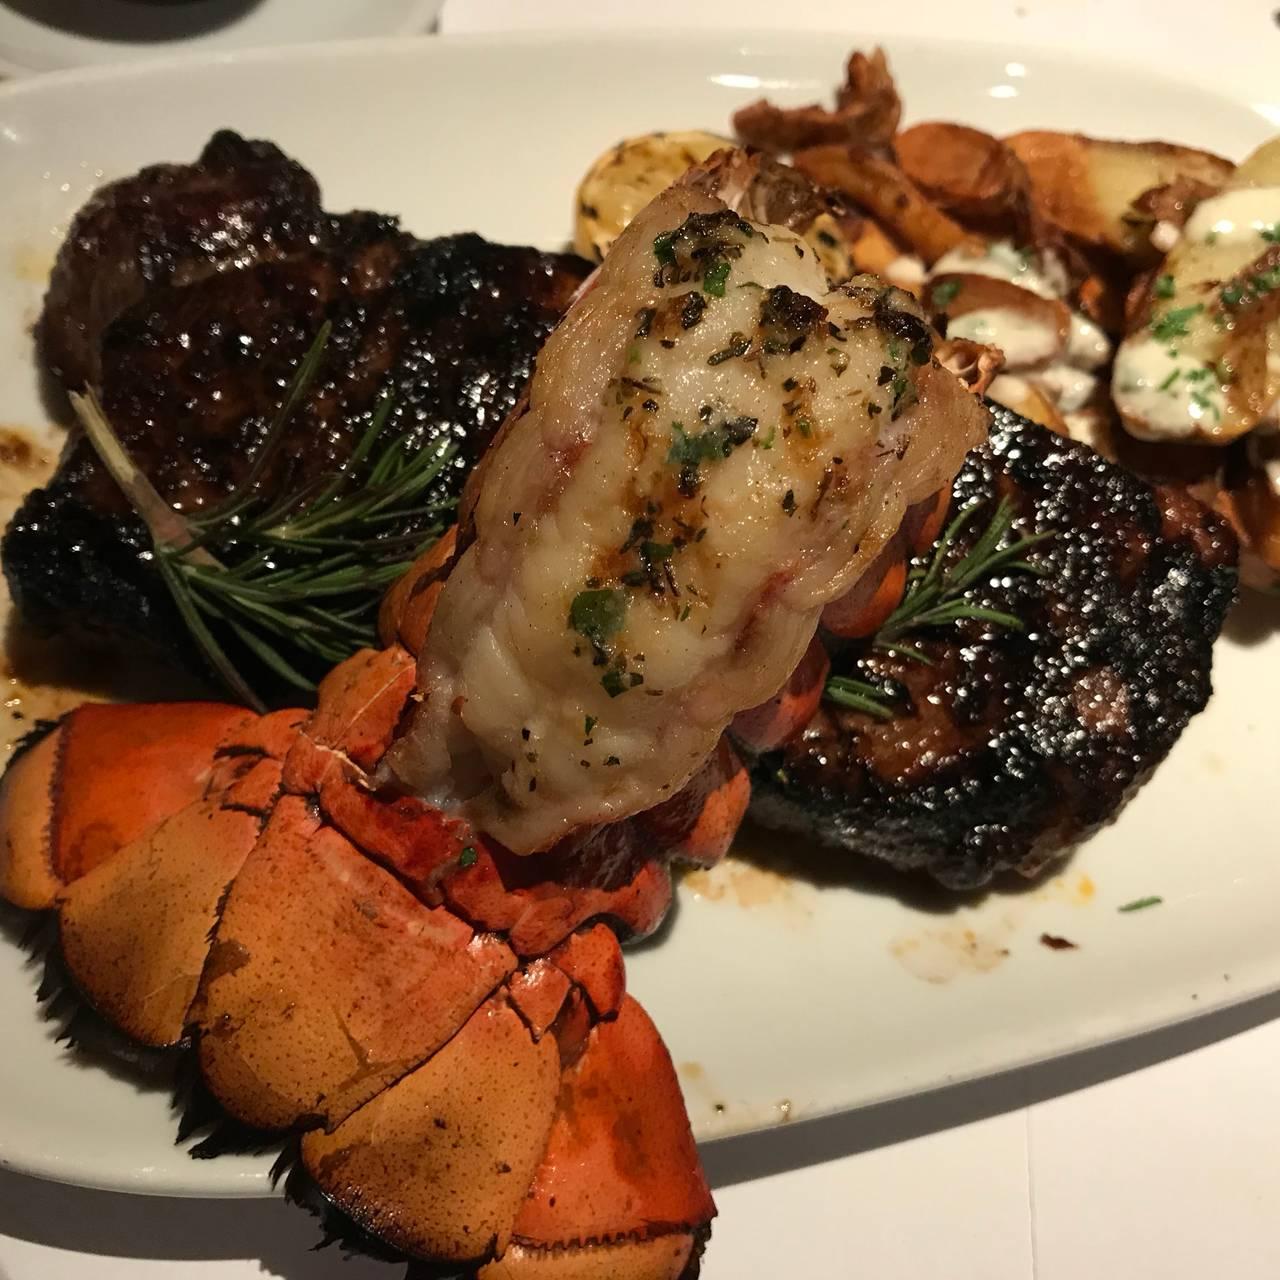 BRIO Tuscan Grille - Rancho Cucamonga - Victoria Gardens Restaurant ...